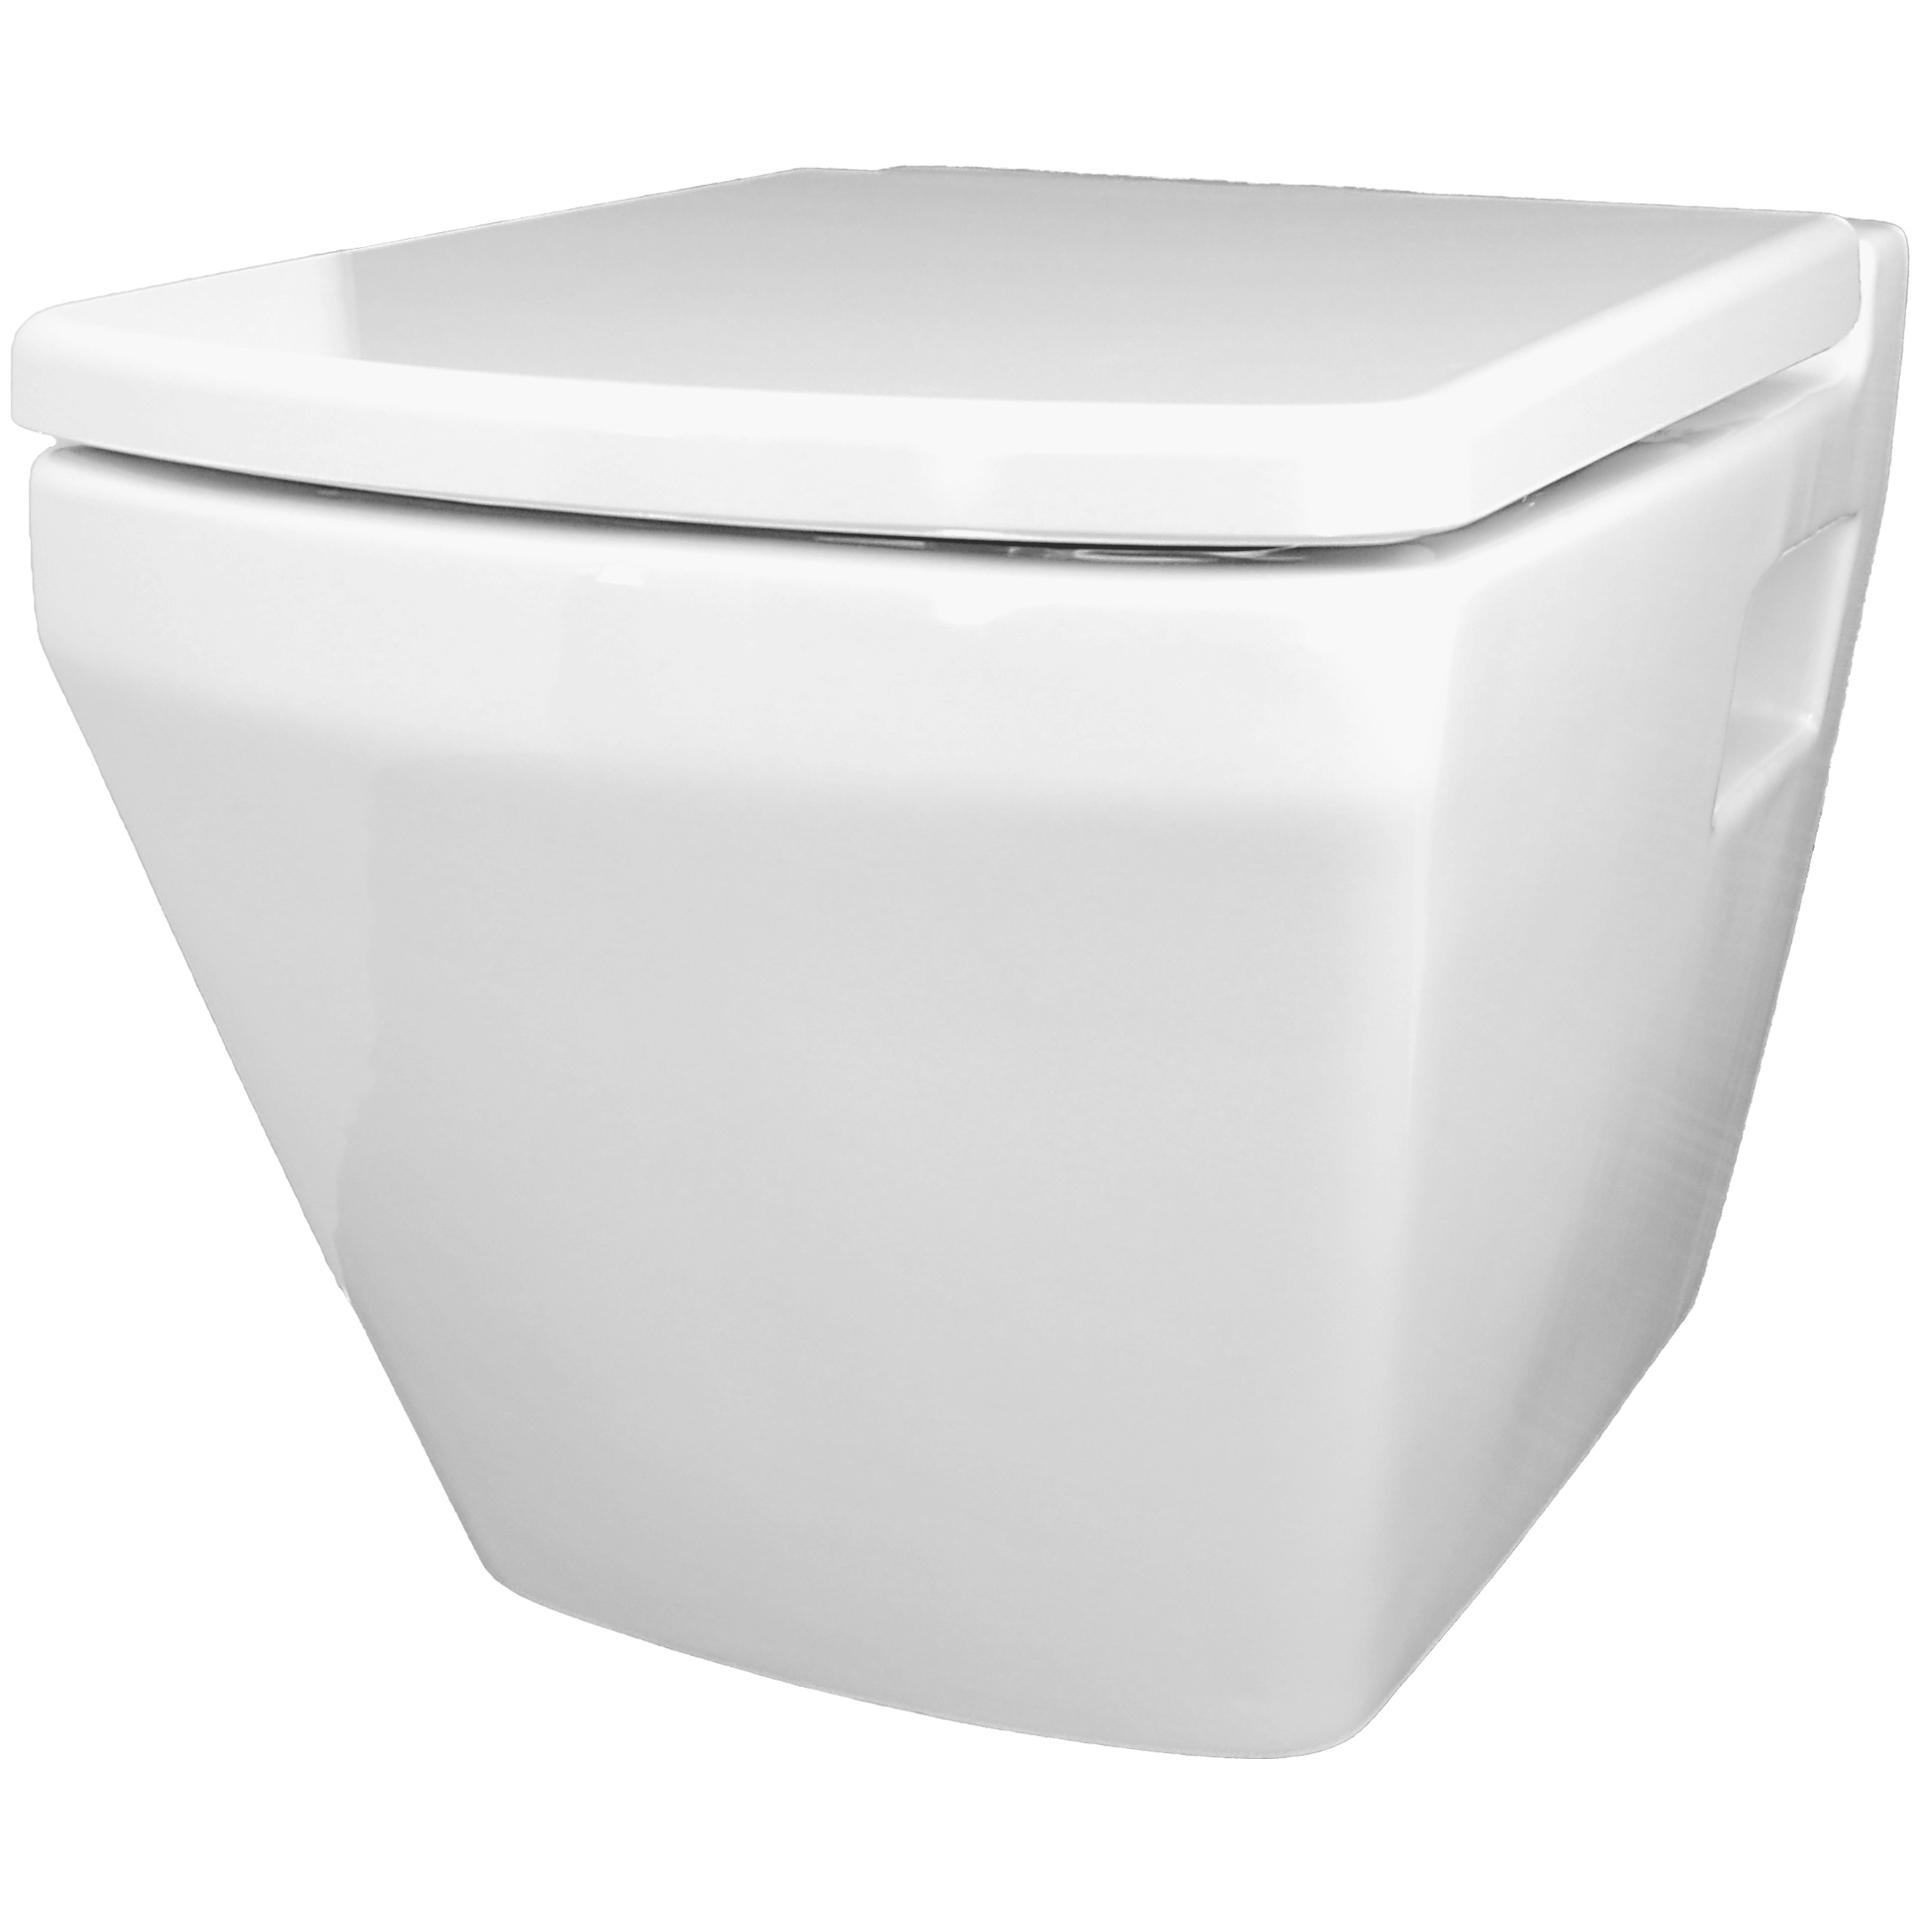 temtasi neptun oa 5201 dusch wc temtasi preiswerte dusch wcs ohne elektronik direkt vom. Black Bedroom Furniture Sets. Home Design Ideas